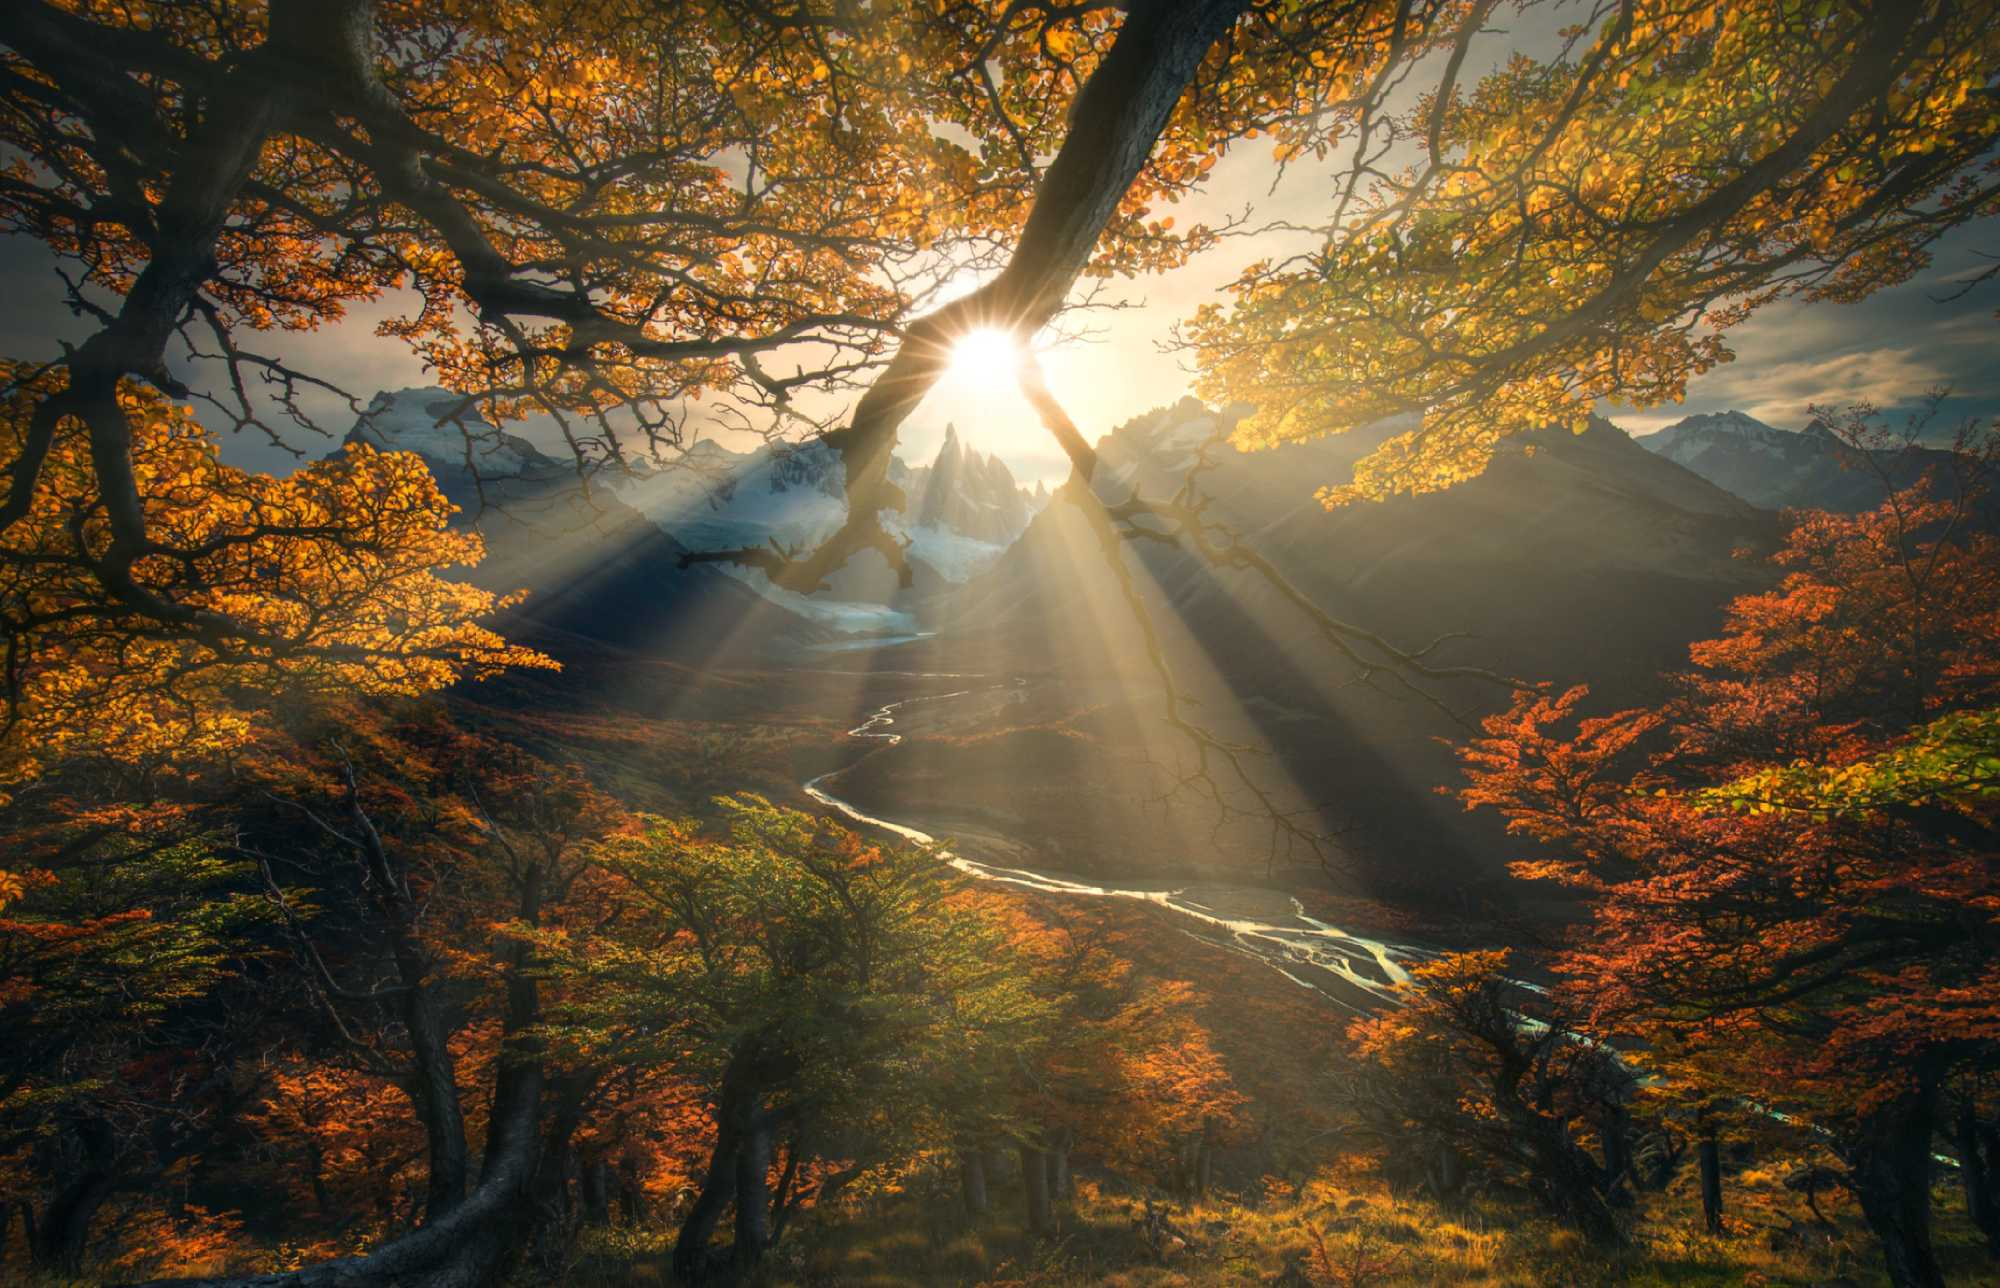 luminar realistic sun rays image